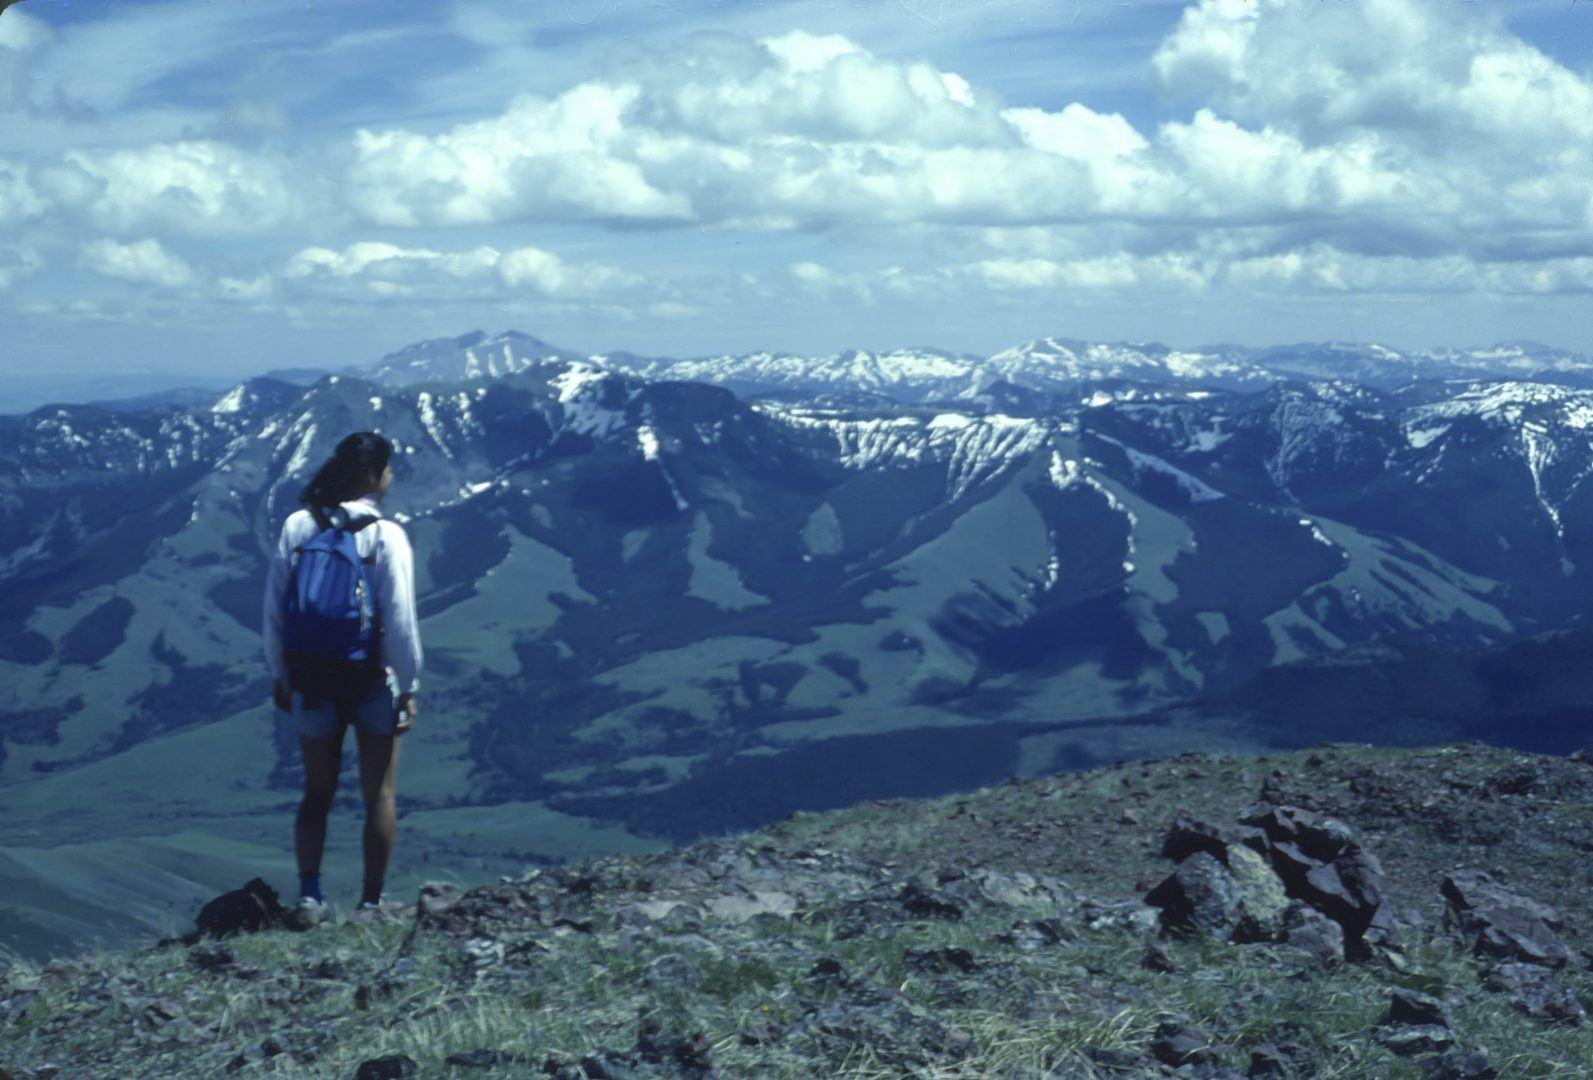 Mollie Matteson on Ramshorn Peak above Tom Miner Basin, Gallatin Range, Gallatin National Forest, Montana © George Wuerthner